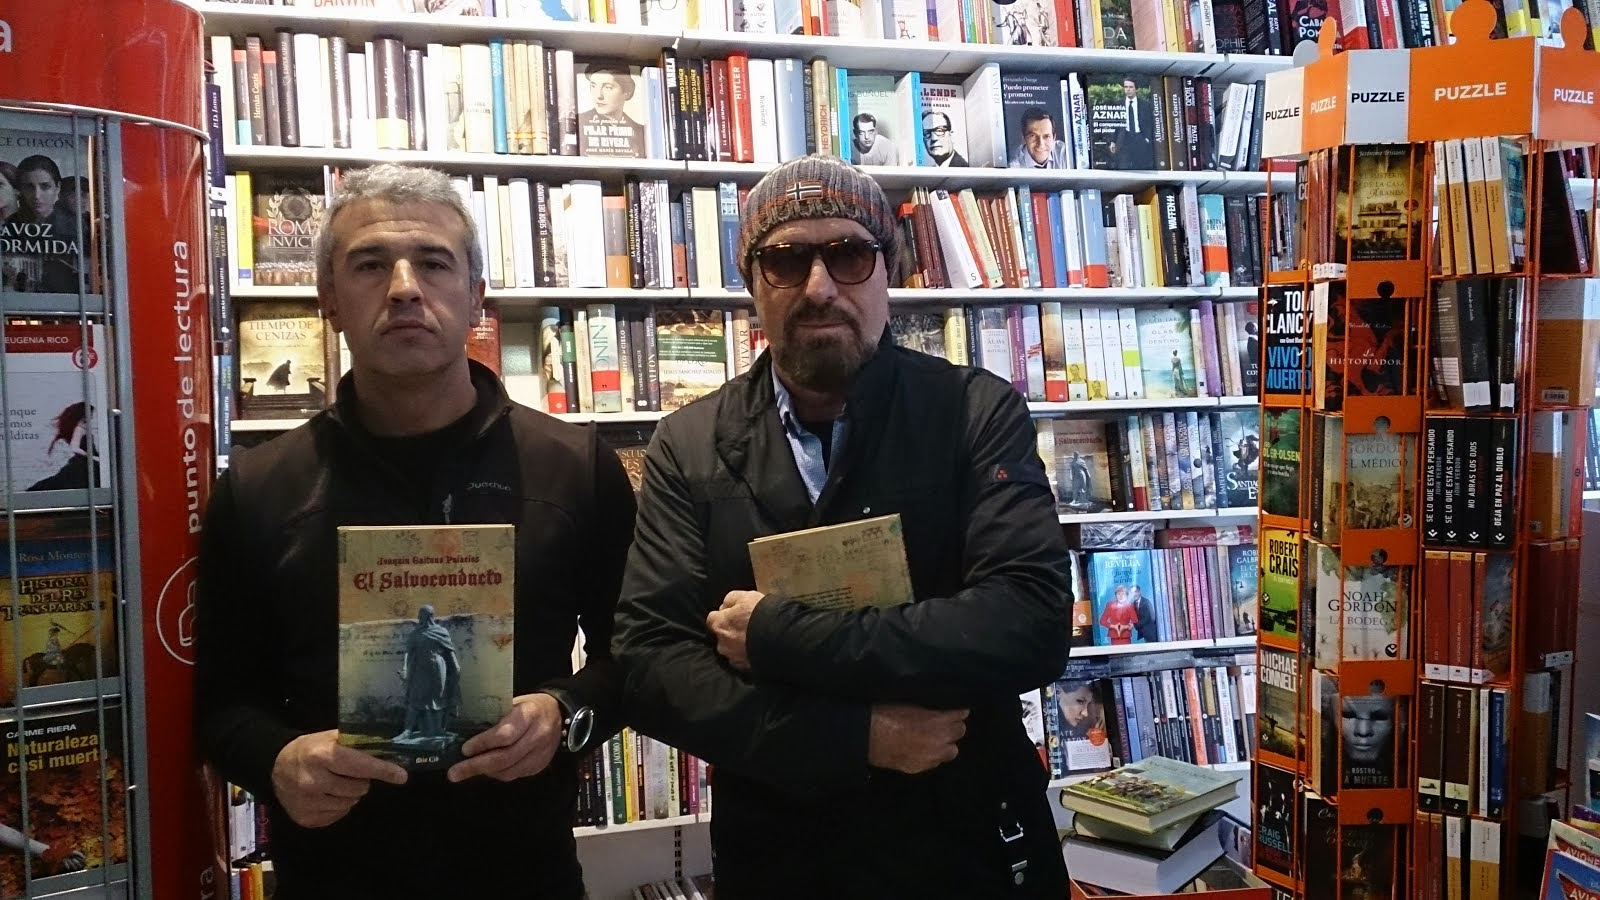 Con Aitor. Librería Teorema, San Joan, Alicante.